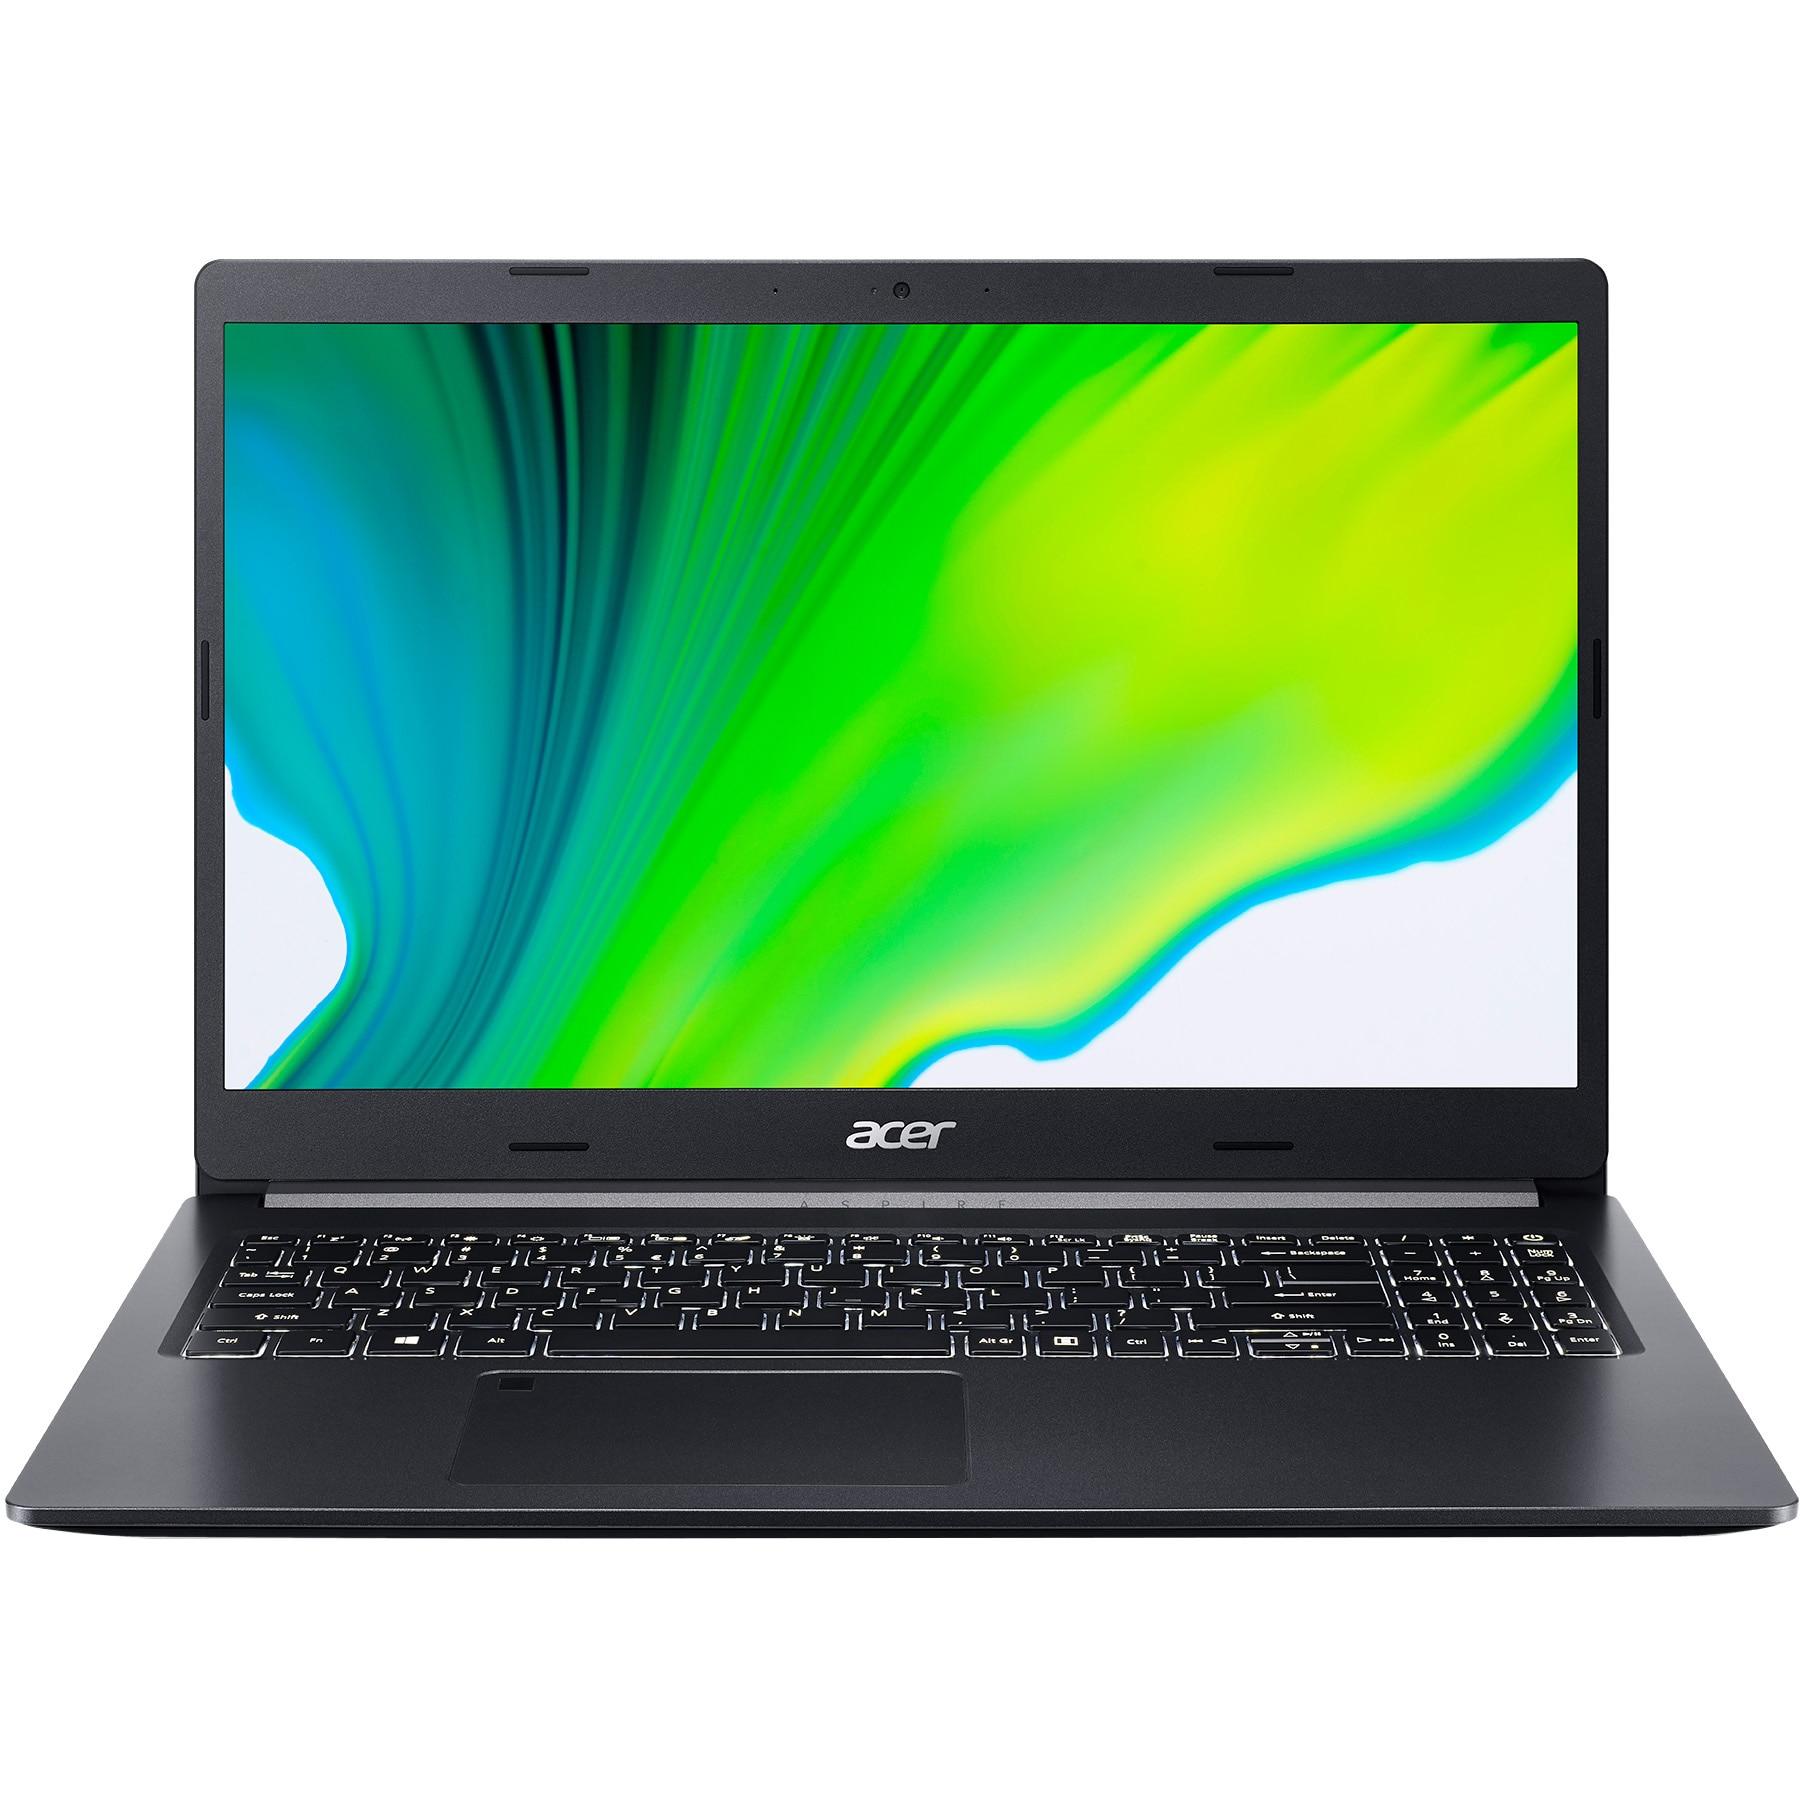 "Fotografie Laptop Acer Aspire 5 A515-44 cu procesor AMD Ryzen 7 4700U pana la 4.10 GHz, 15.6"", Full HD, 16GB, 512GB SSD, AMD Radeon™ Graphics, No Os, Black"